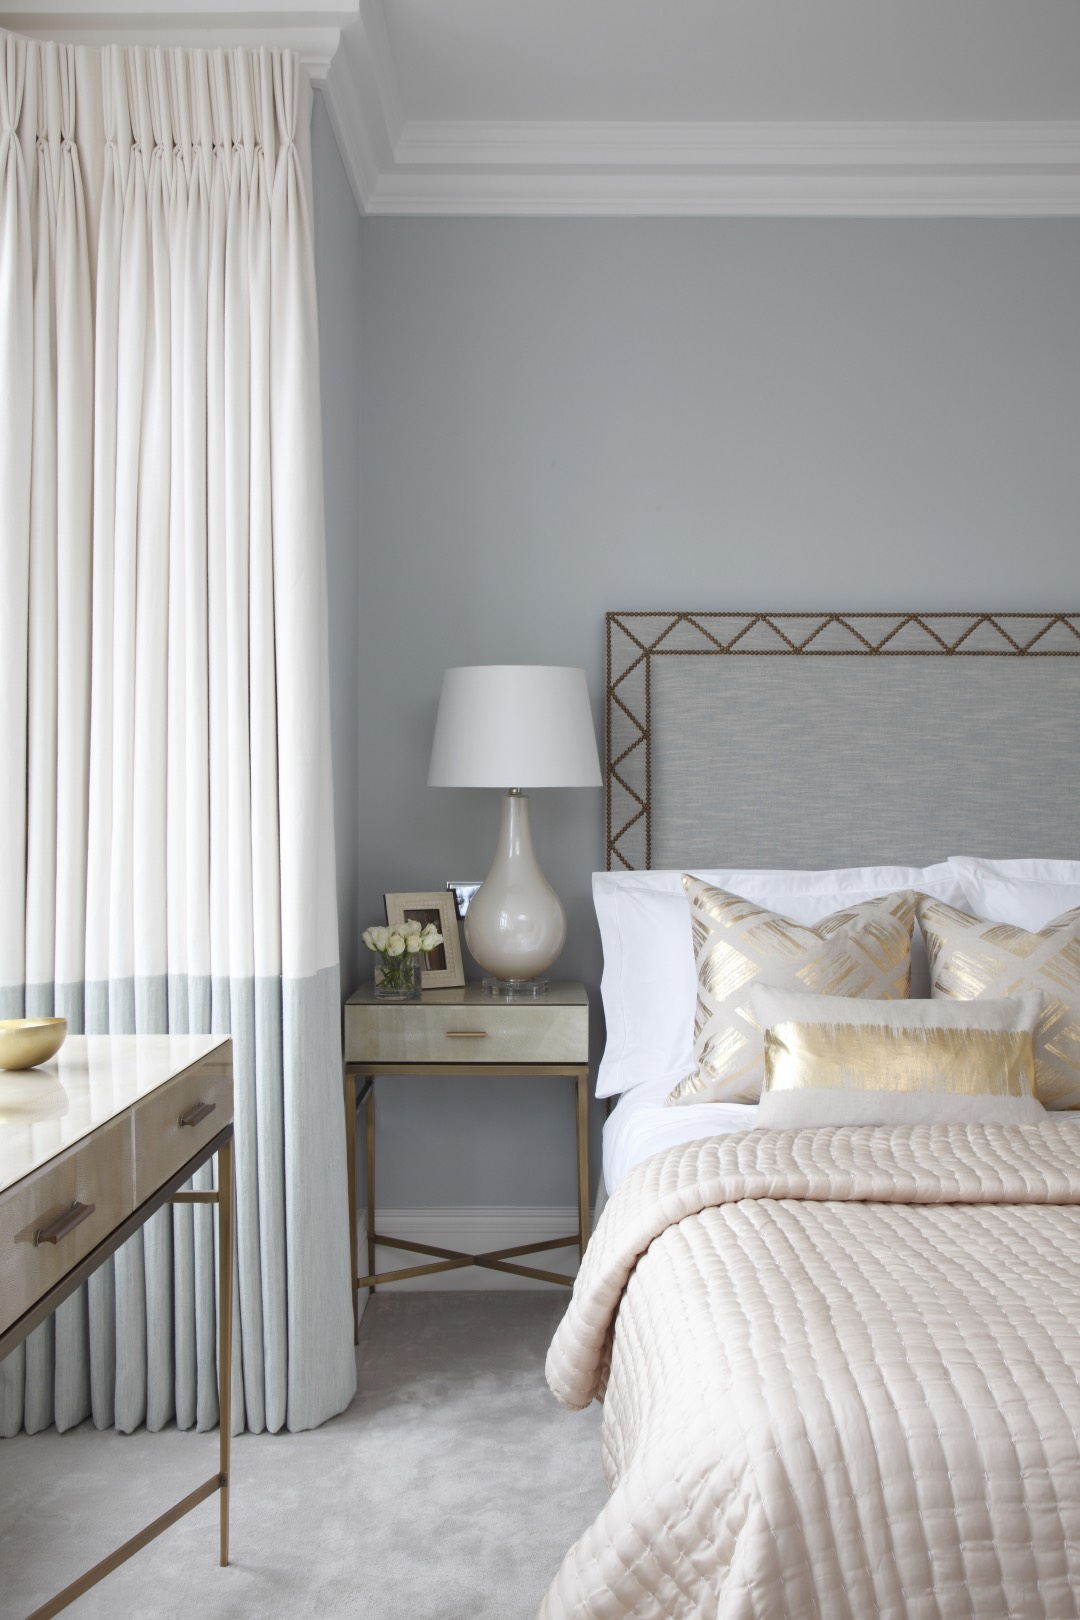 carter_wells_interior_designer_agency